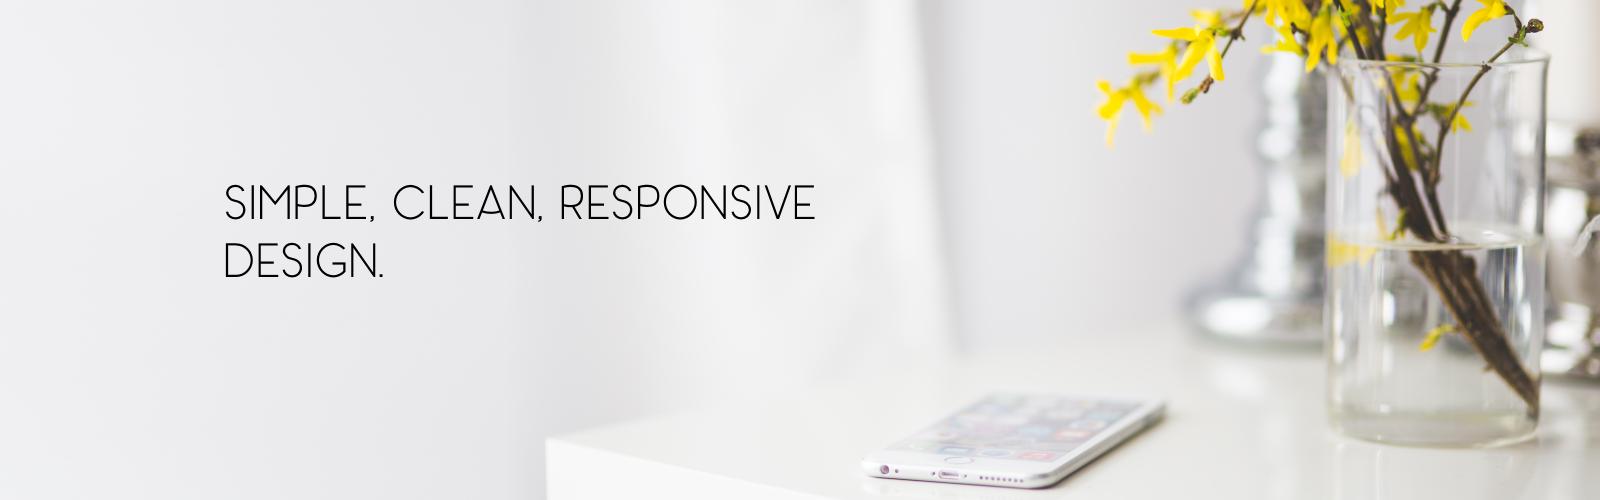 simple responsive design